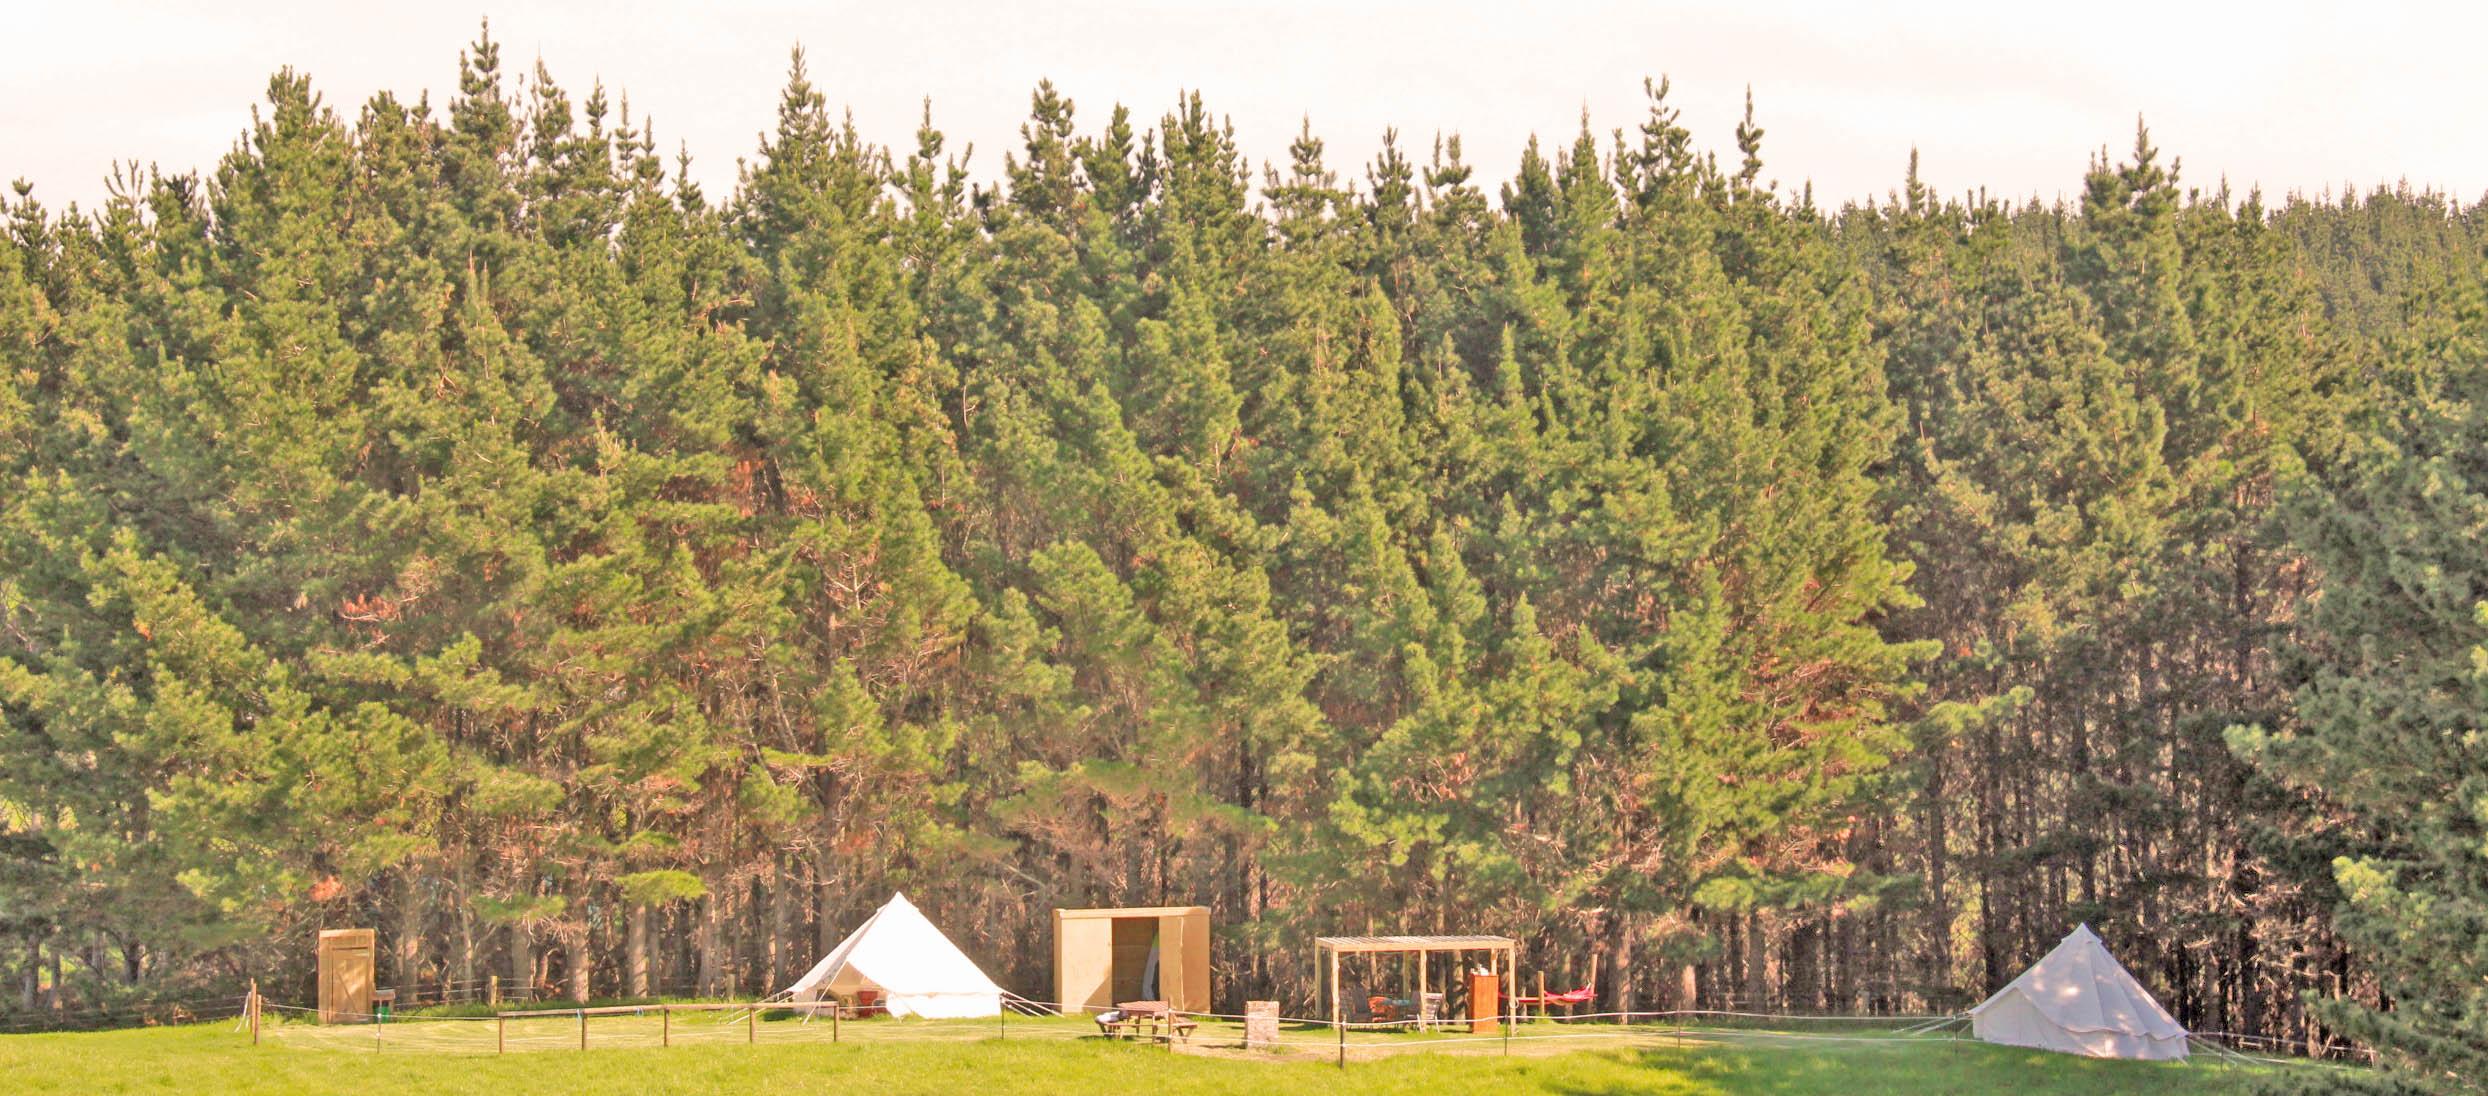 Forestry getaway!